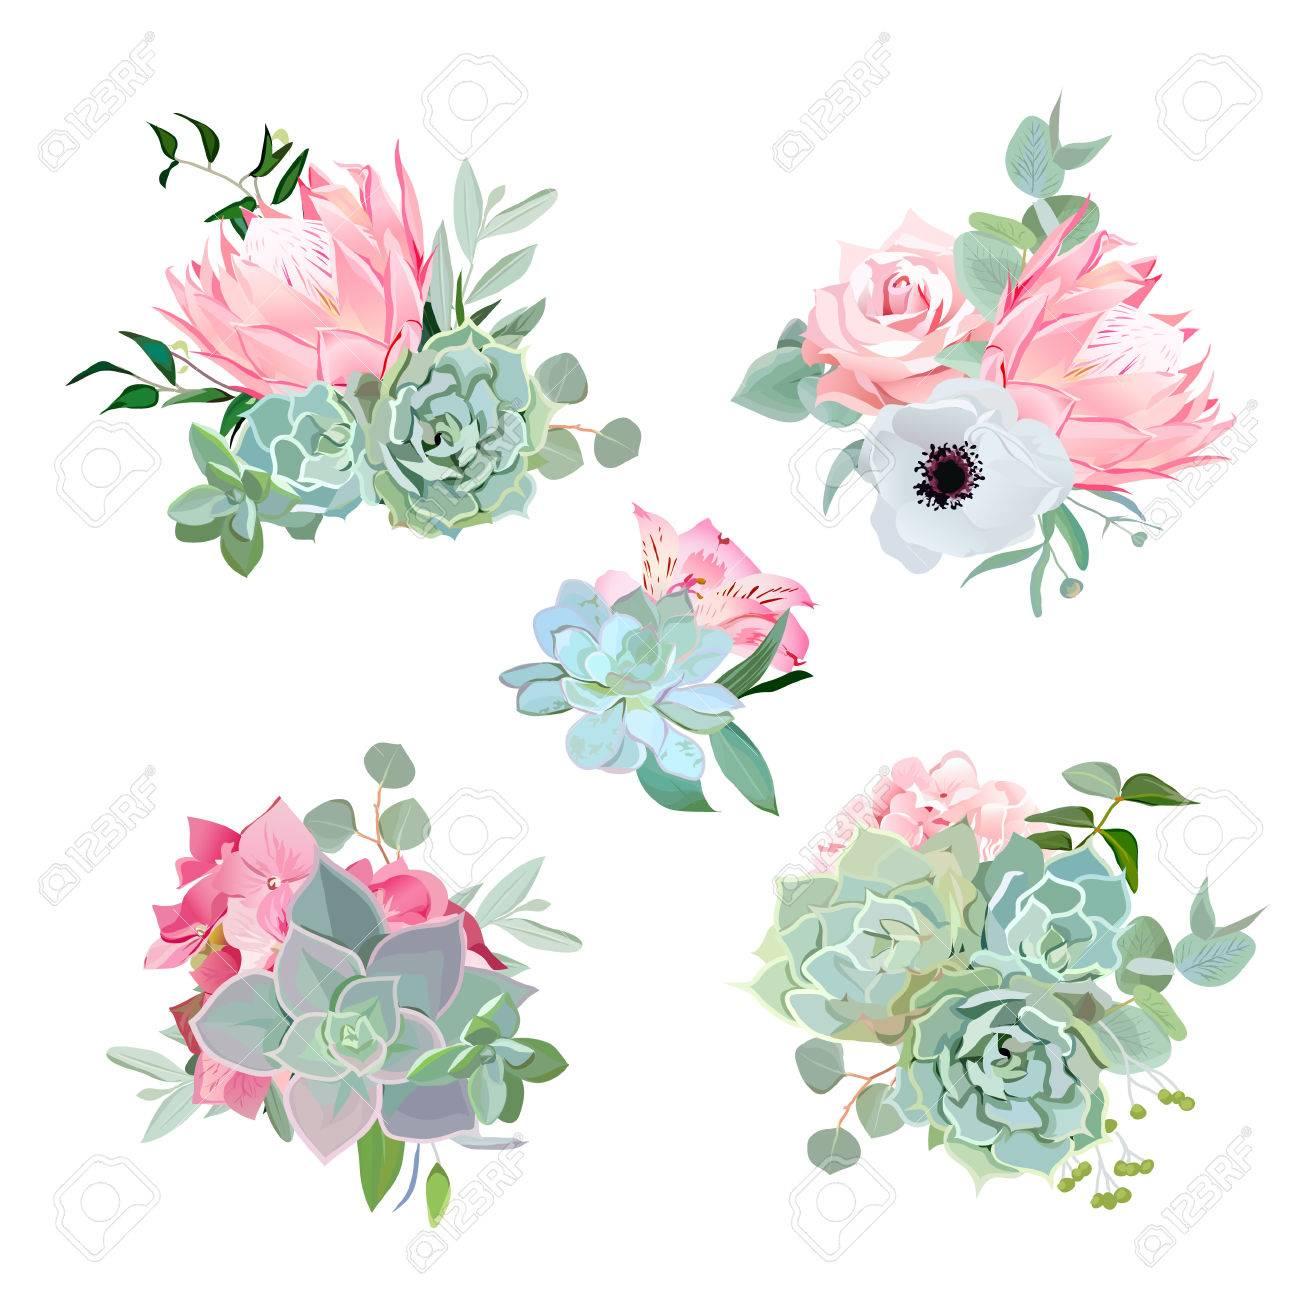 Pequenos Ramos De Flores Elegantes De Plantas Suculentas Protea